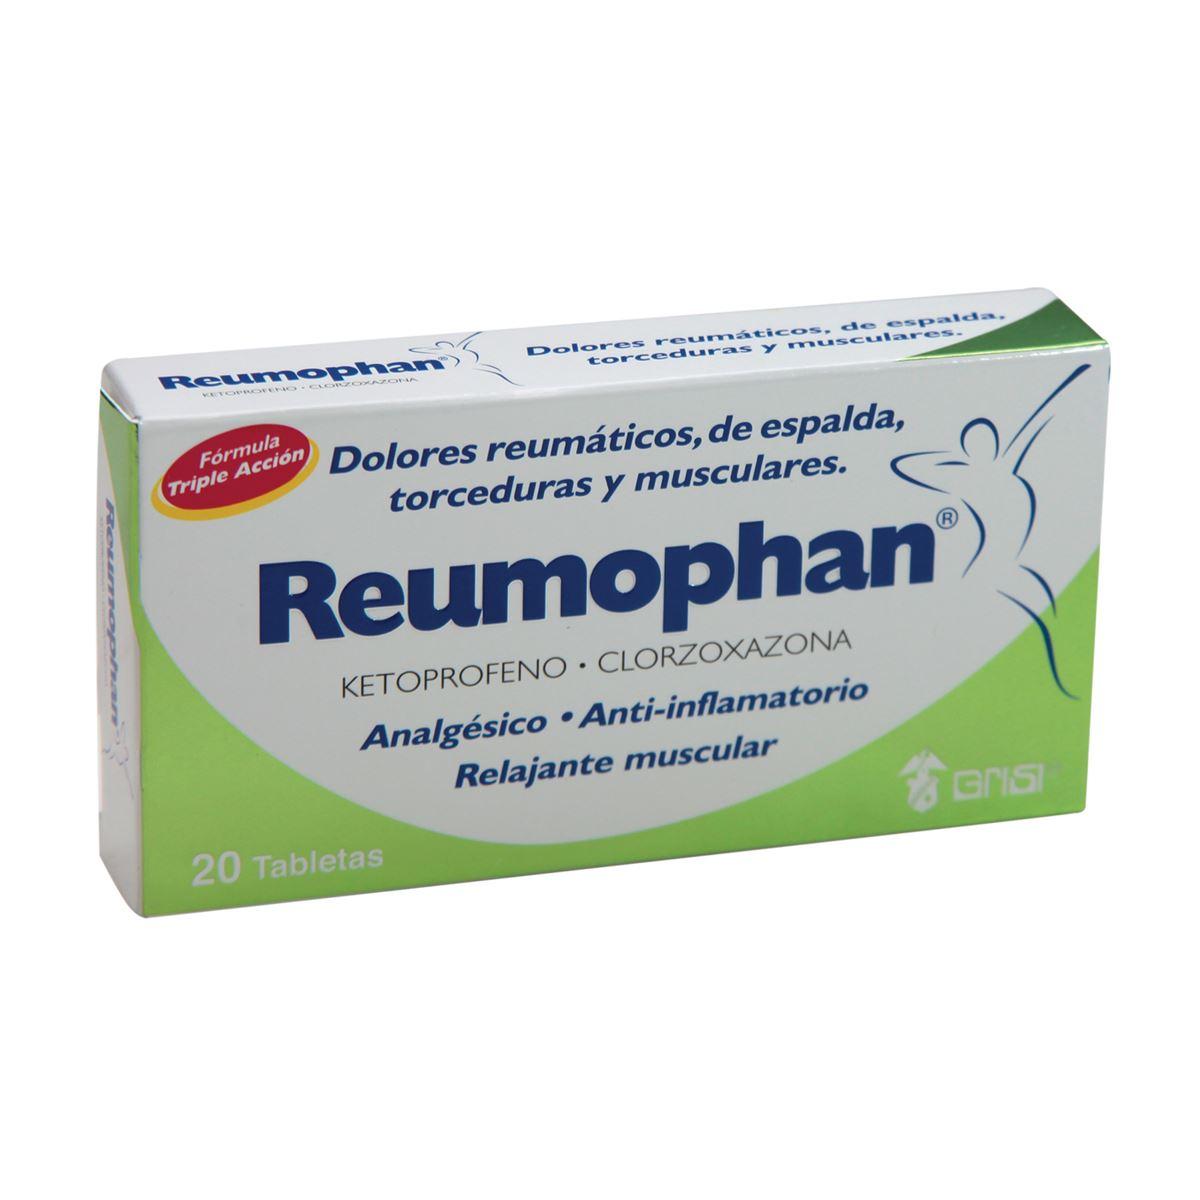 Reumophan 20 tabletas  - Sanborns